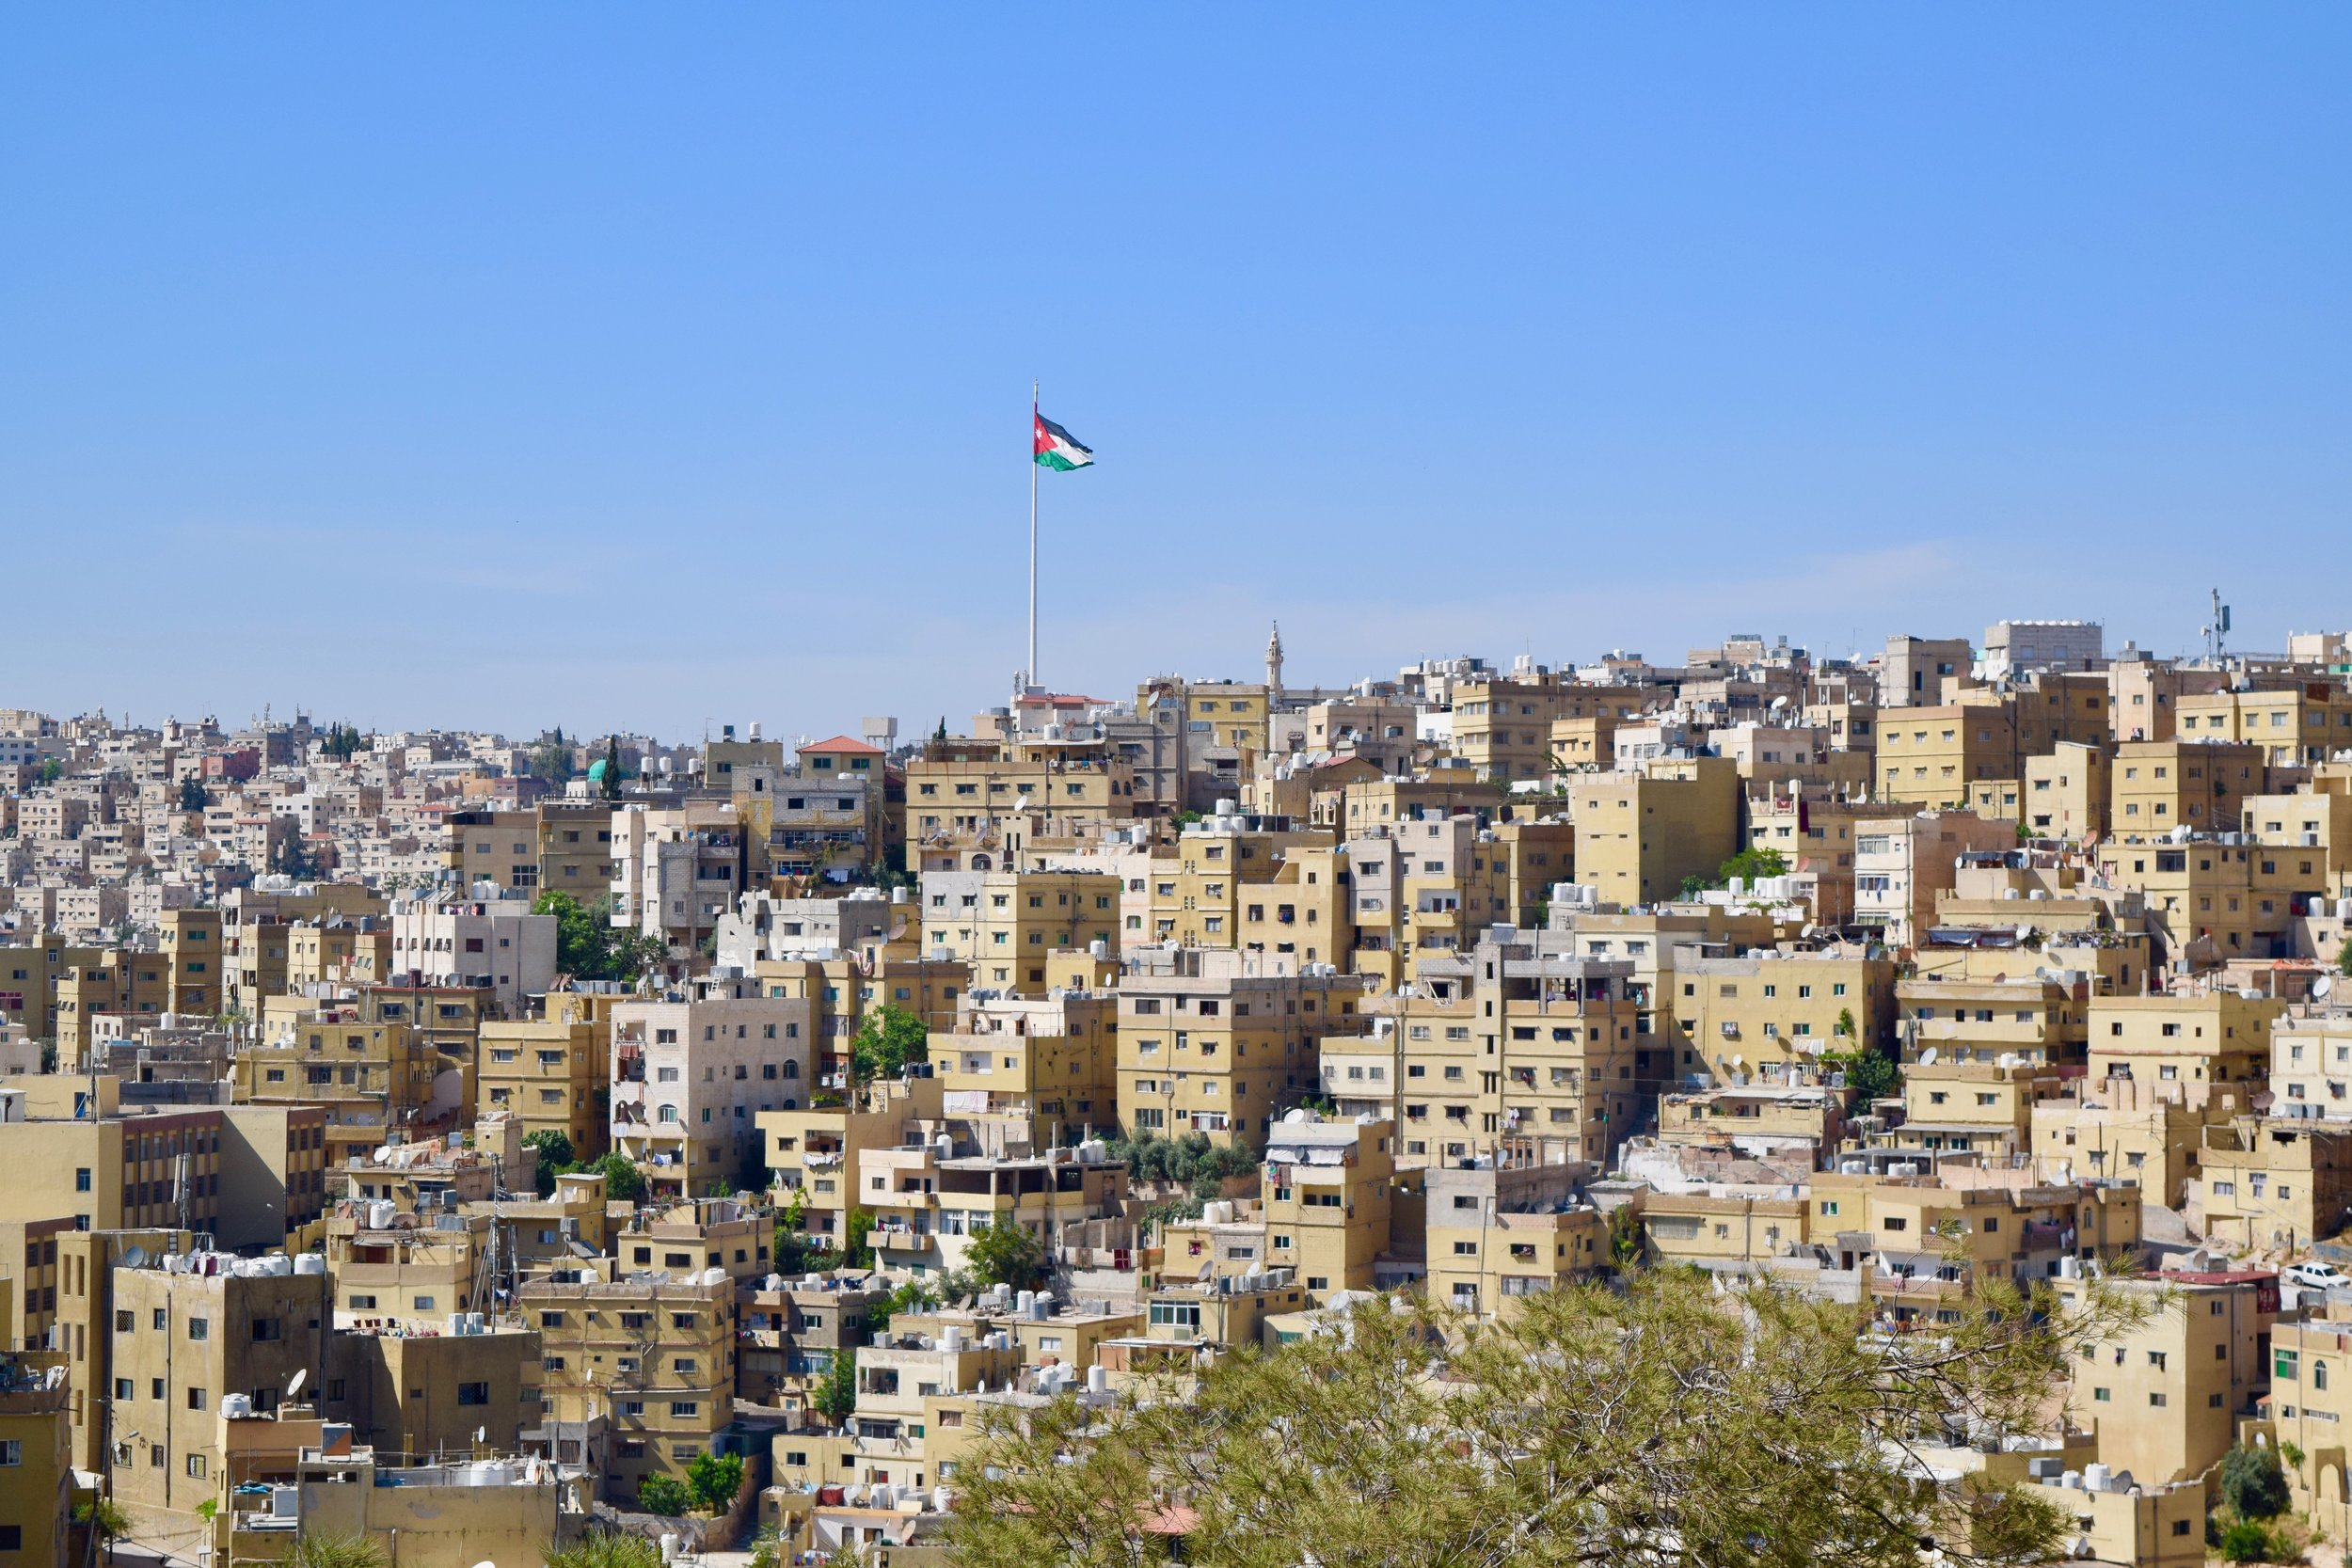 Giant Jordanian flag